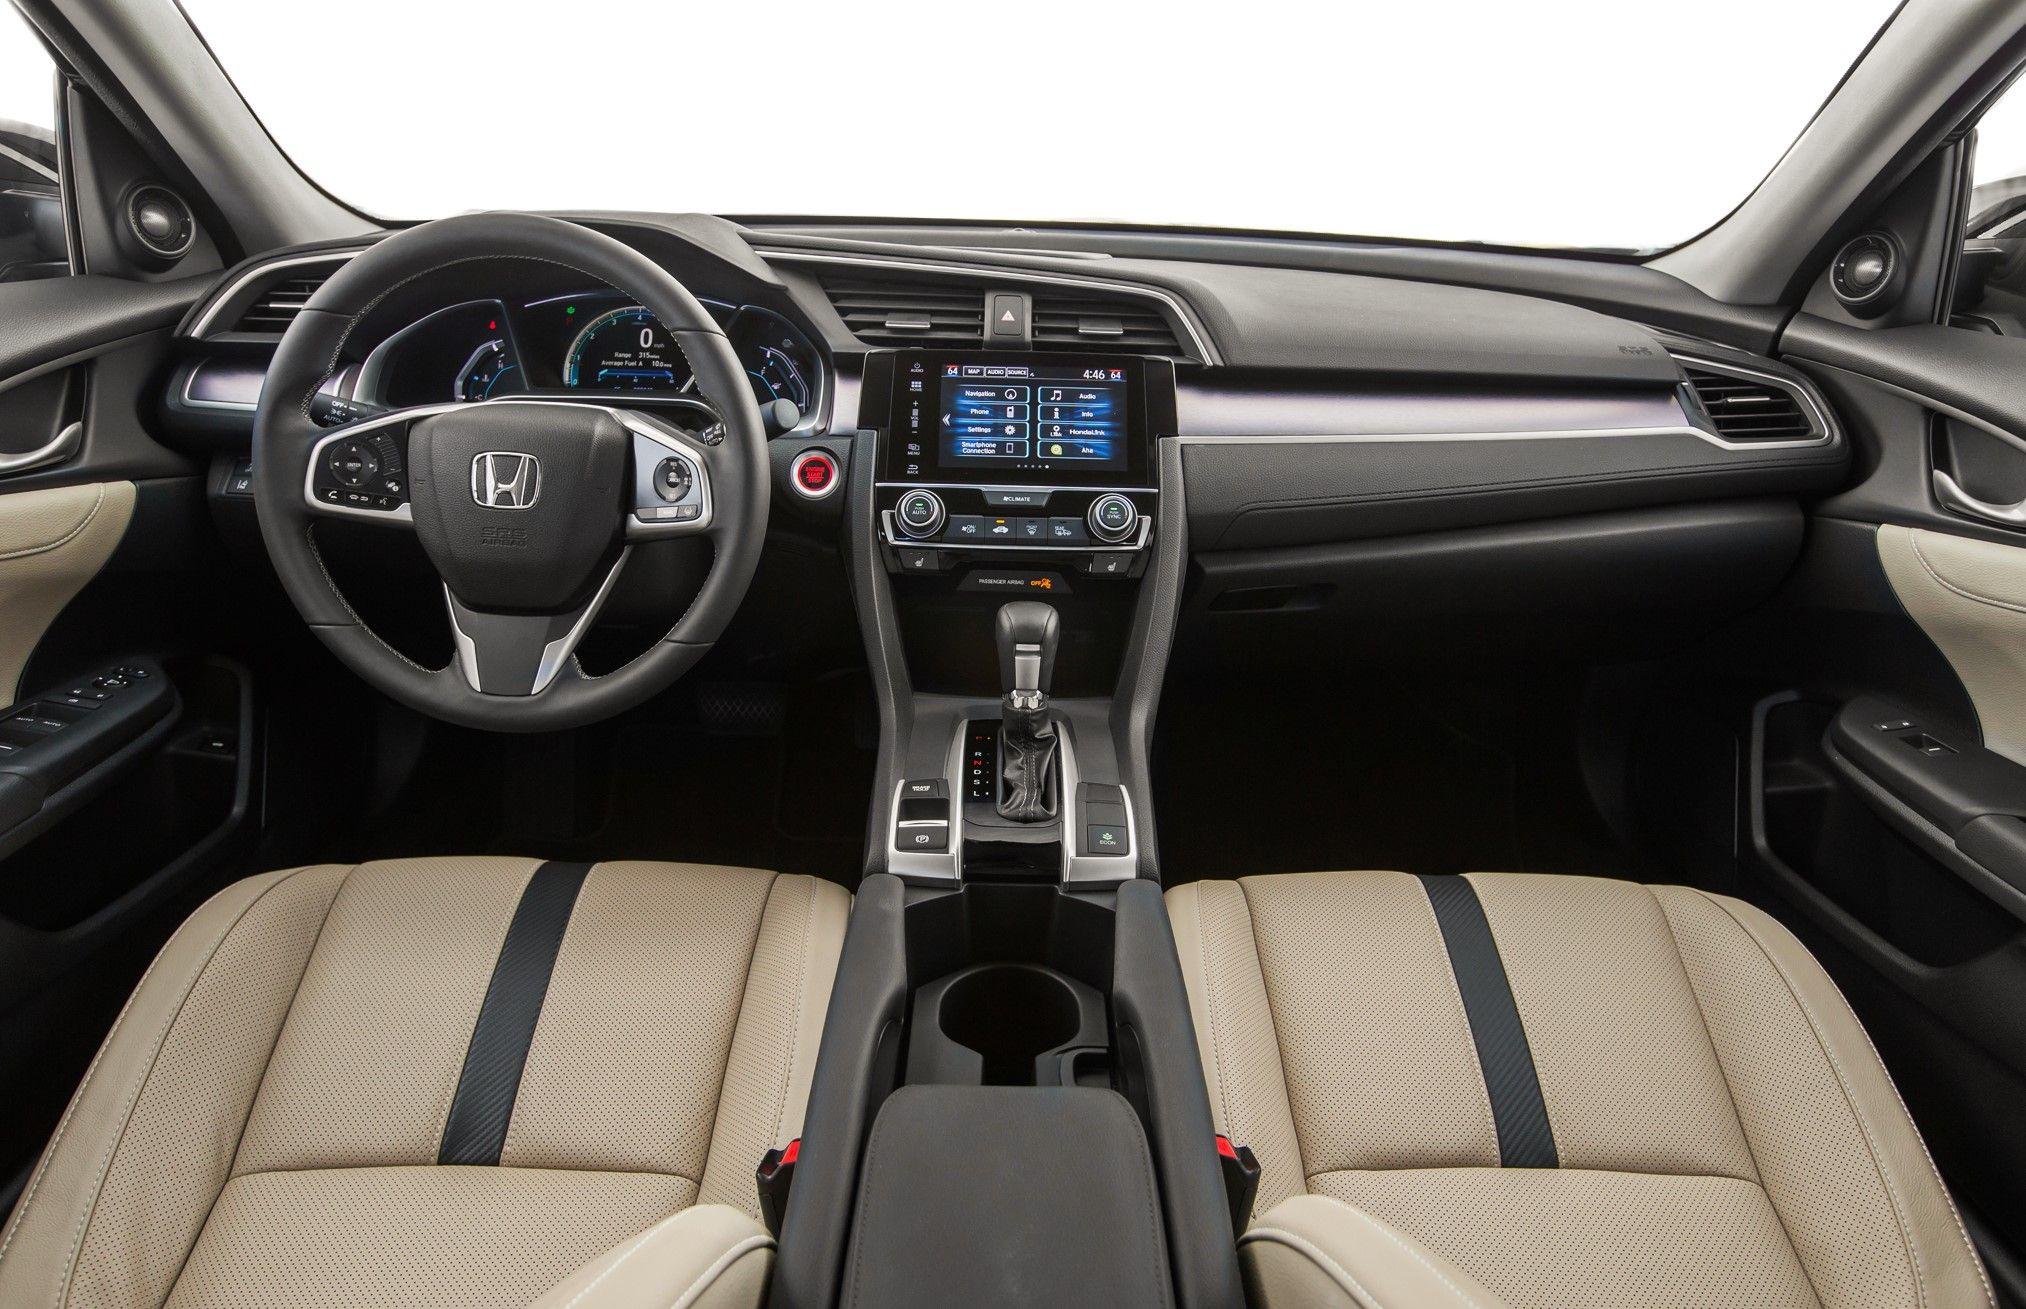 2016 Honda Civic 4 Door Hatchback Touring Edition Honda Civic 2016 Honda Civic 2016 Honda Civic Sedan